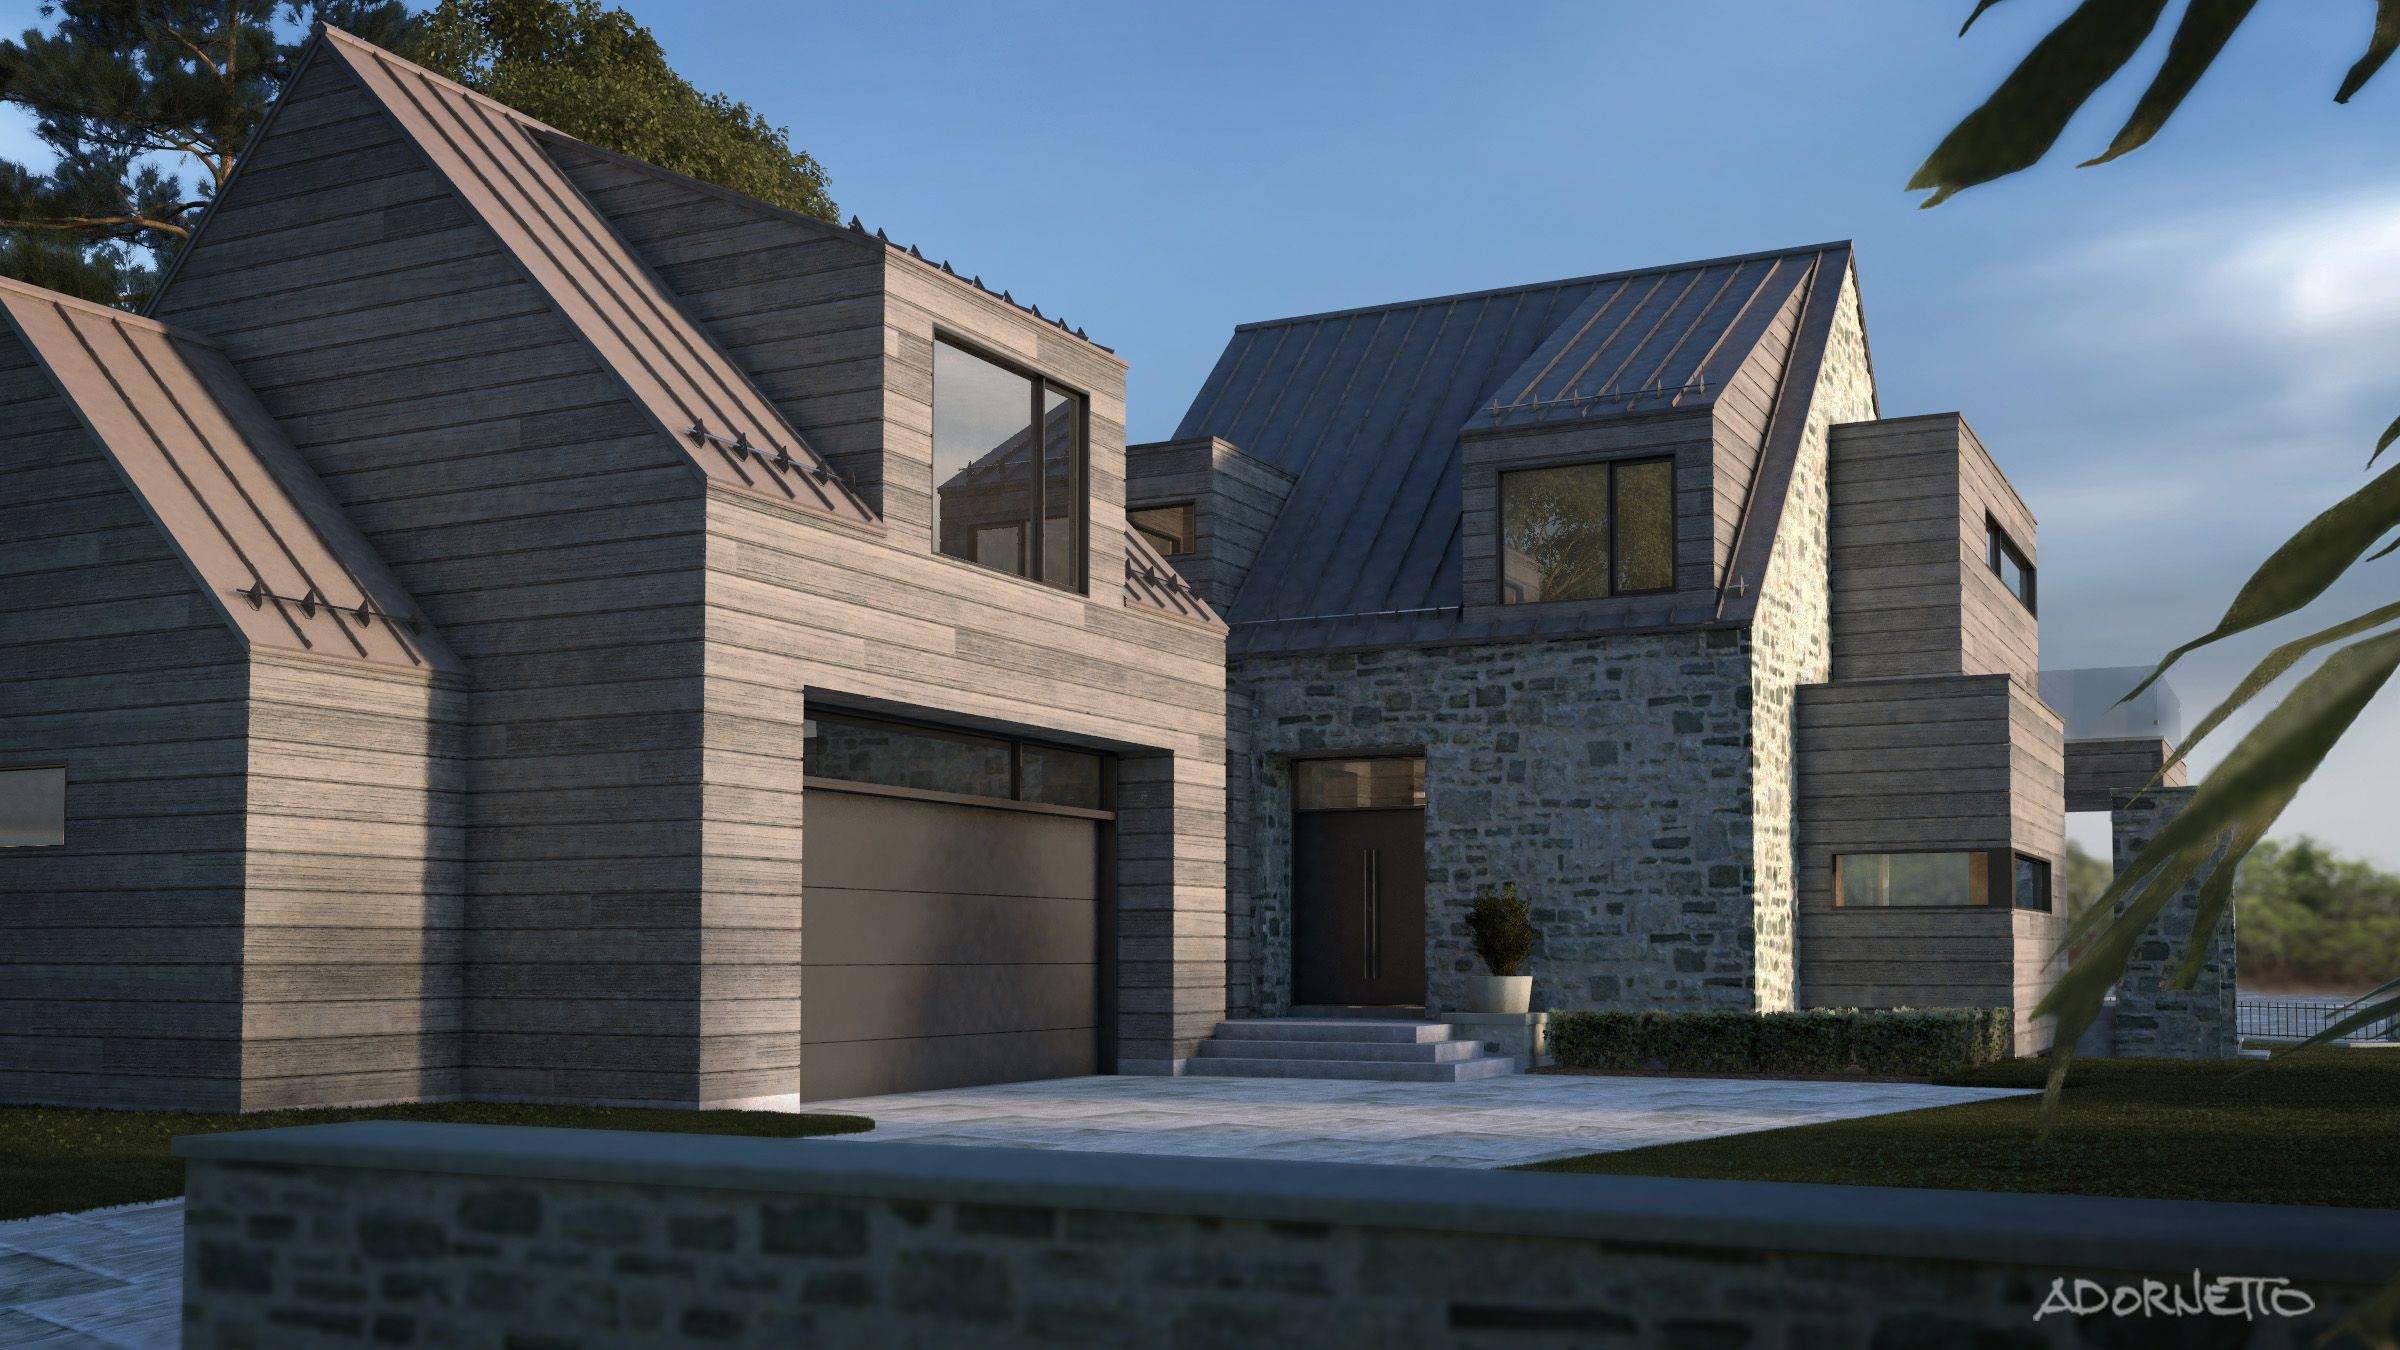 les maisons metisses adornetto mario adornetto With plan de maison facade 4 le refuge adornetto